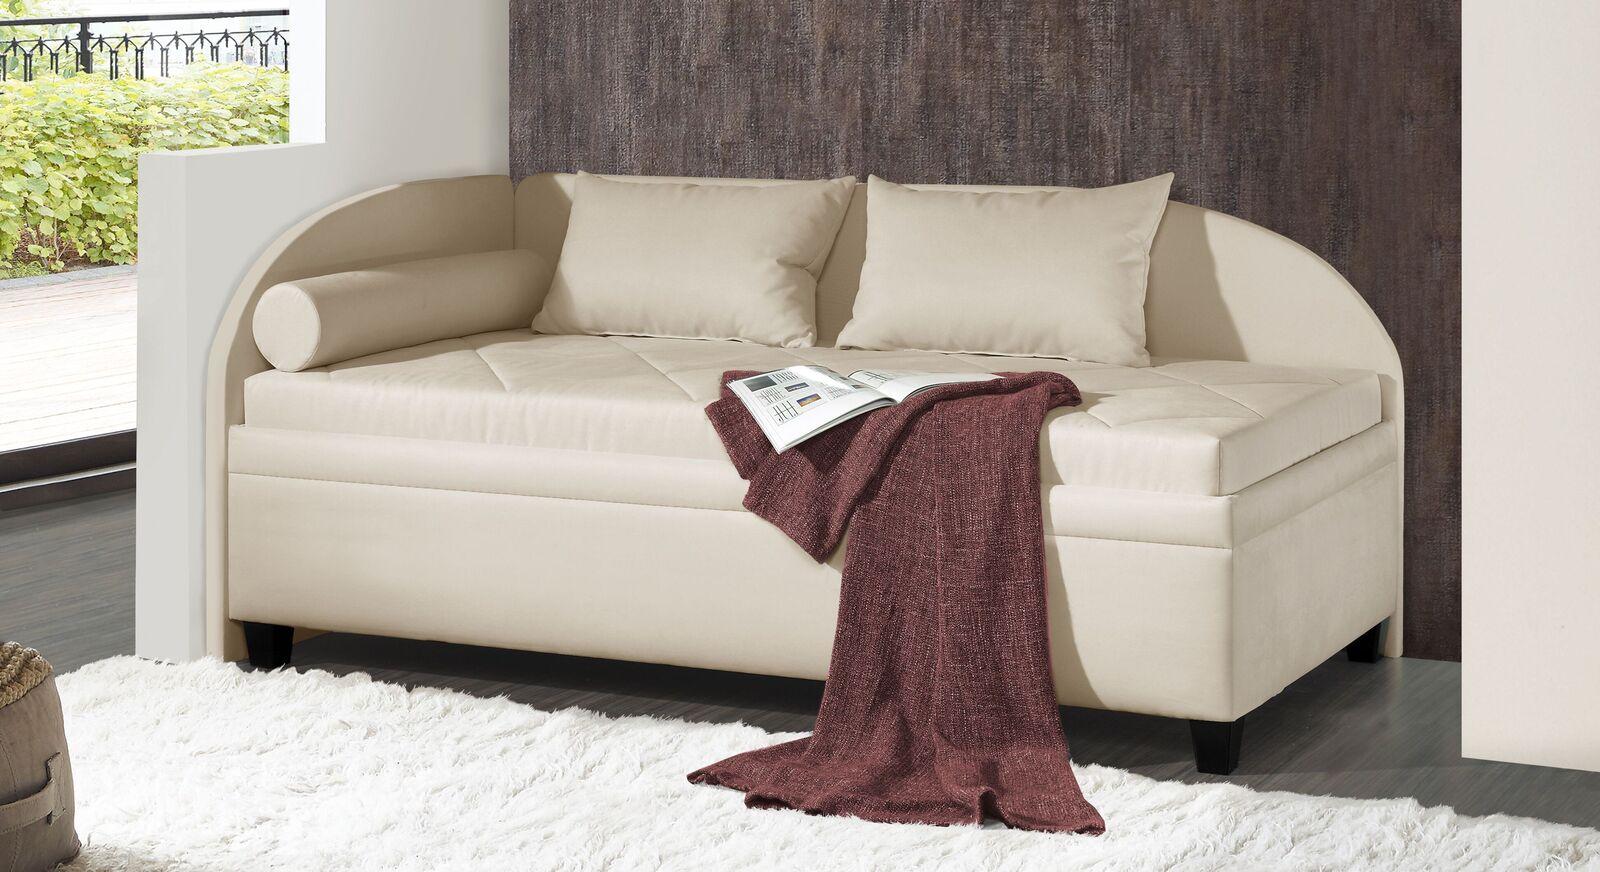 Studioliege Kamina Komfort mit Microvelours-Bezug